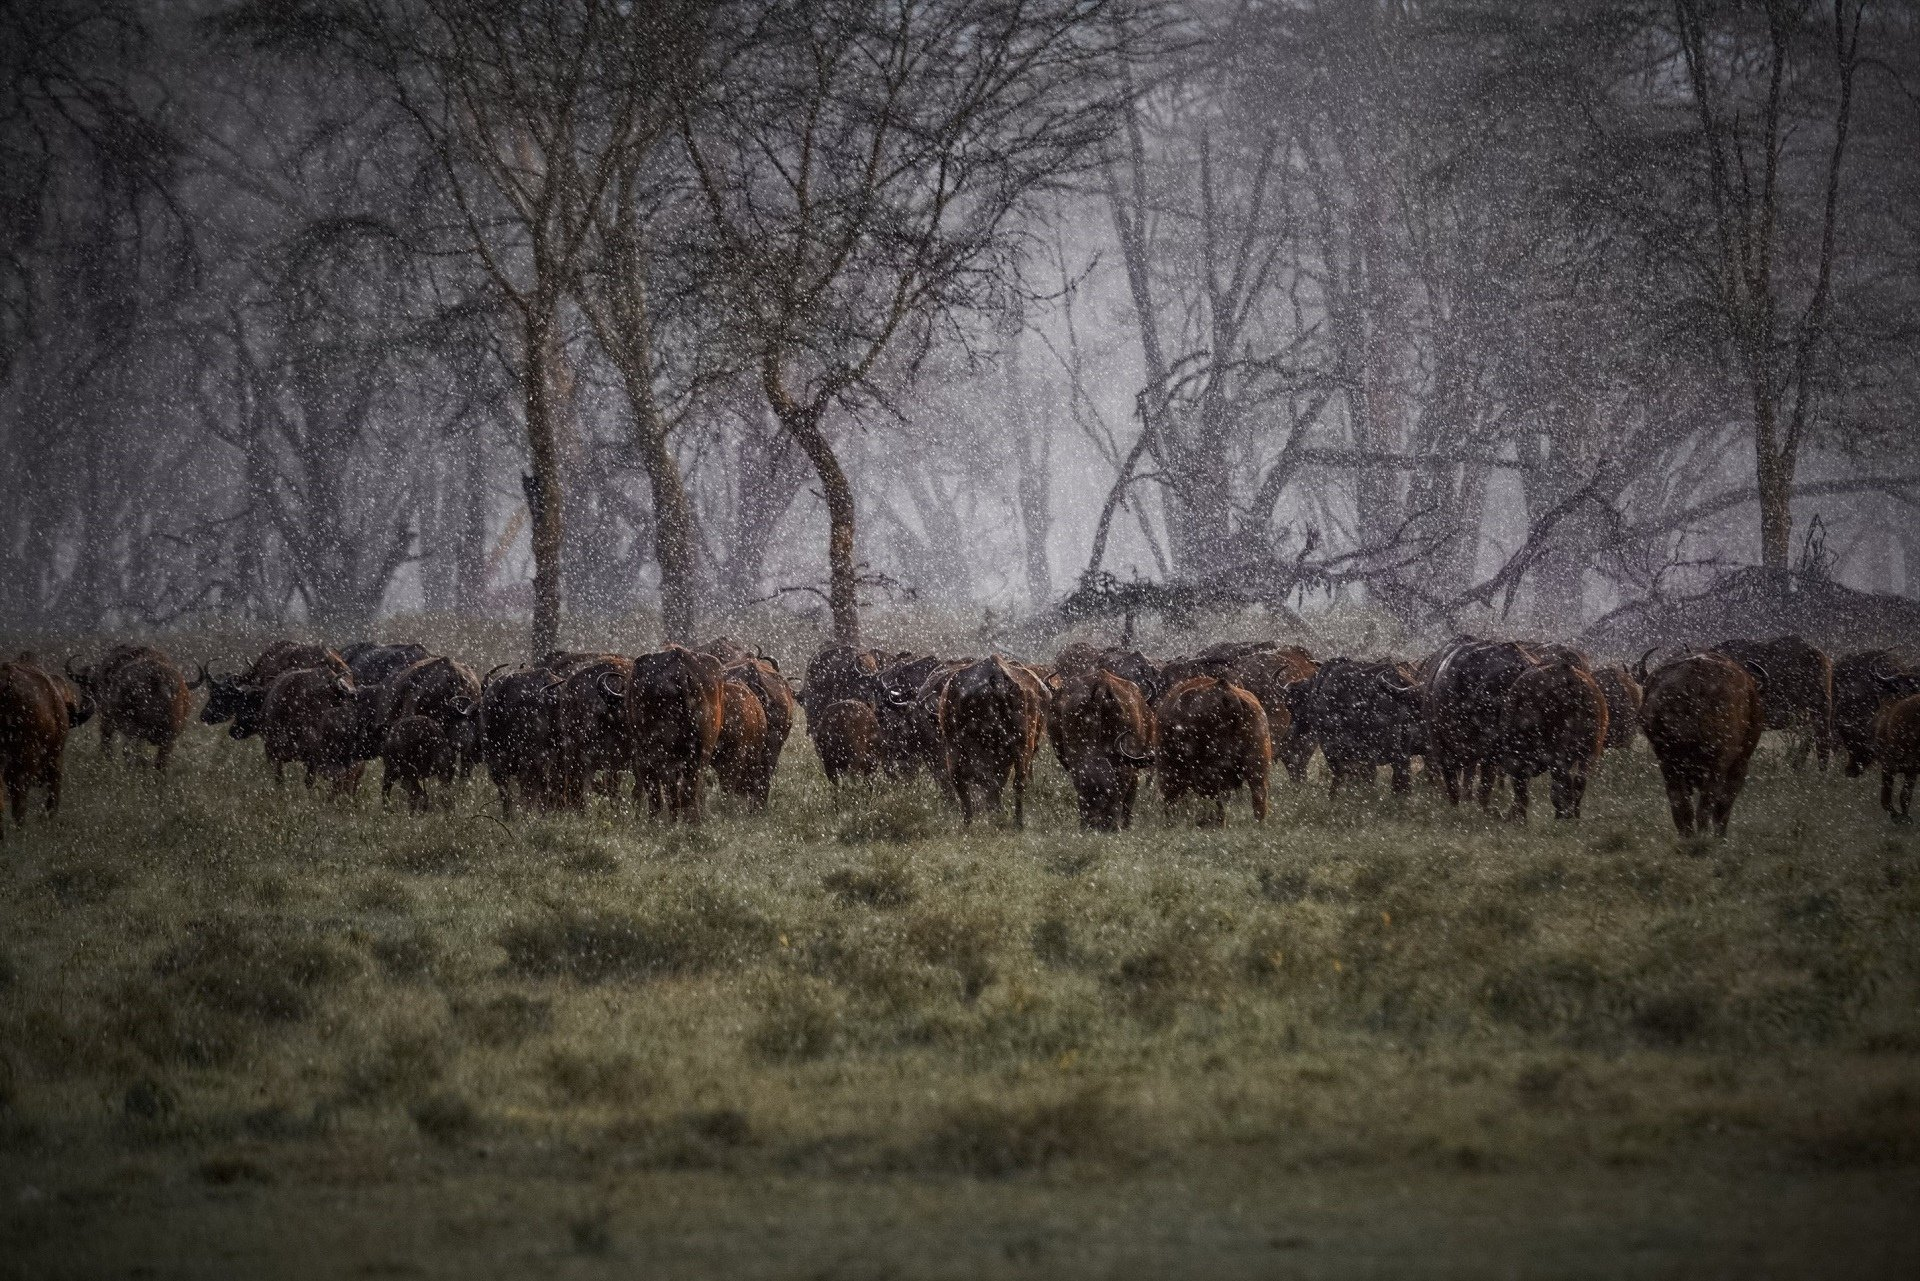 Buffalo Herd Rain Africa Storm Drops Cow Wallpaper